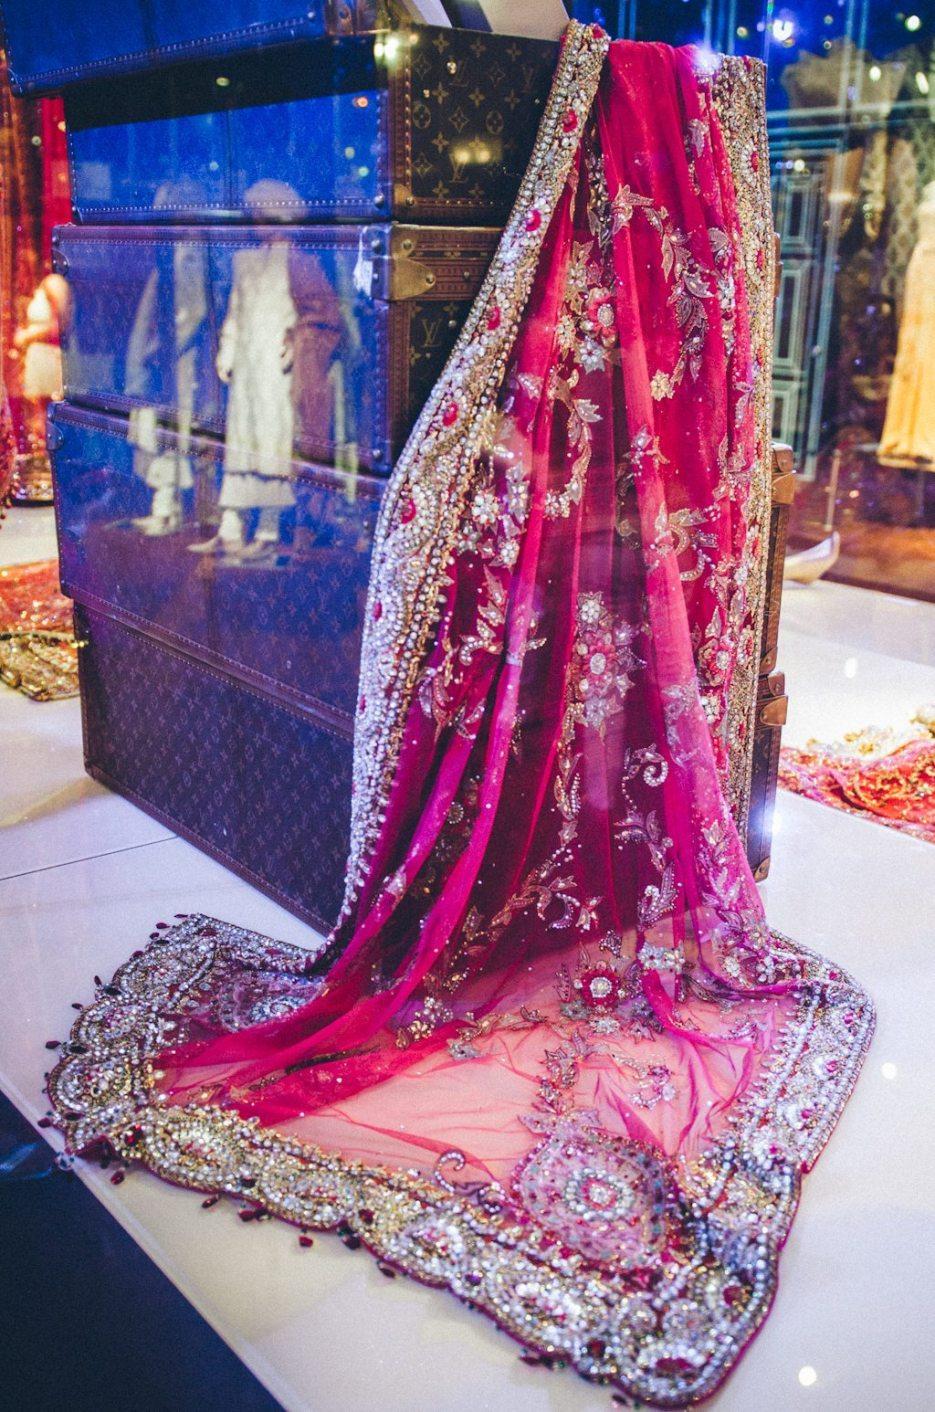 Tarun-Tahiliani-Bridal-Couture-Wedding-Wear-Fashion-Designer-Photographer-Naina-Knottytales-46.jpg